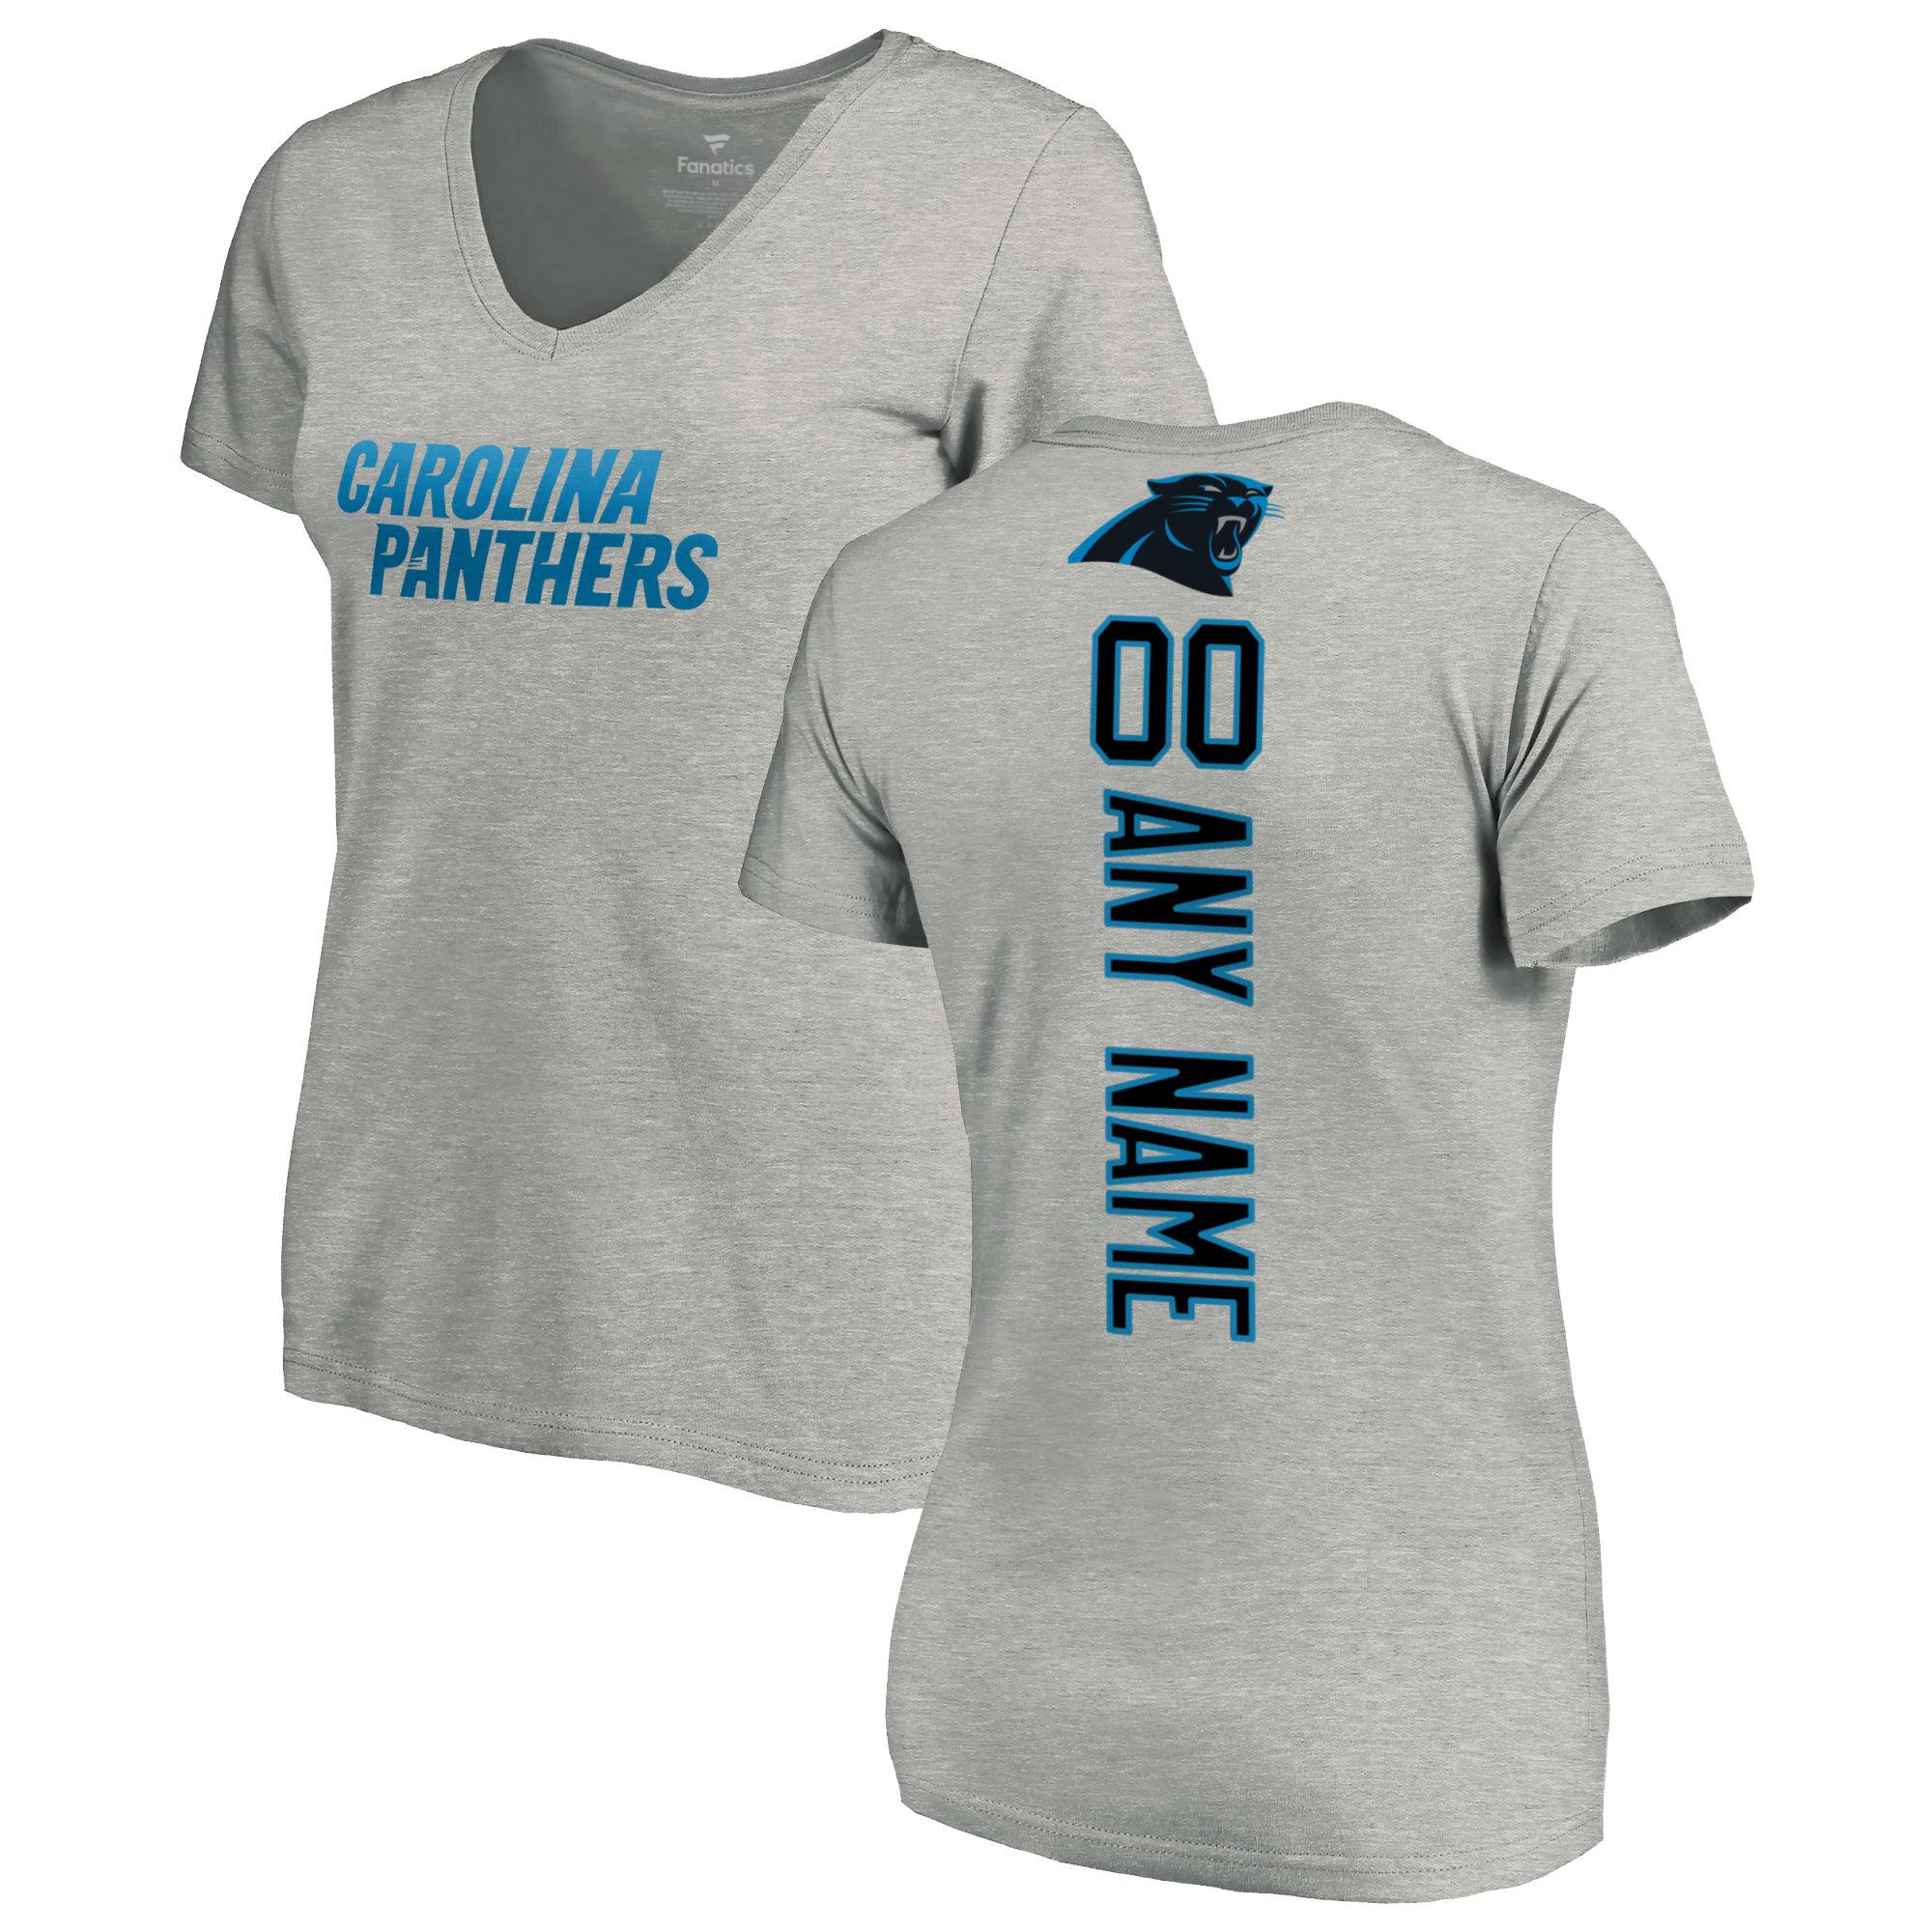 Carolina Panthers NFL Pro Line Women's Personalized Playmaker V-Neck T-Shirt - Ash